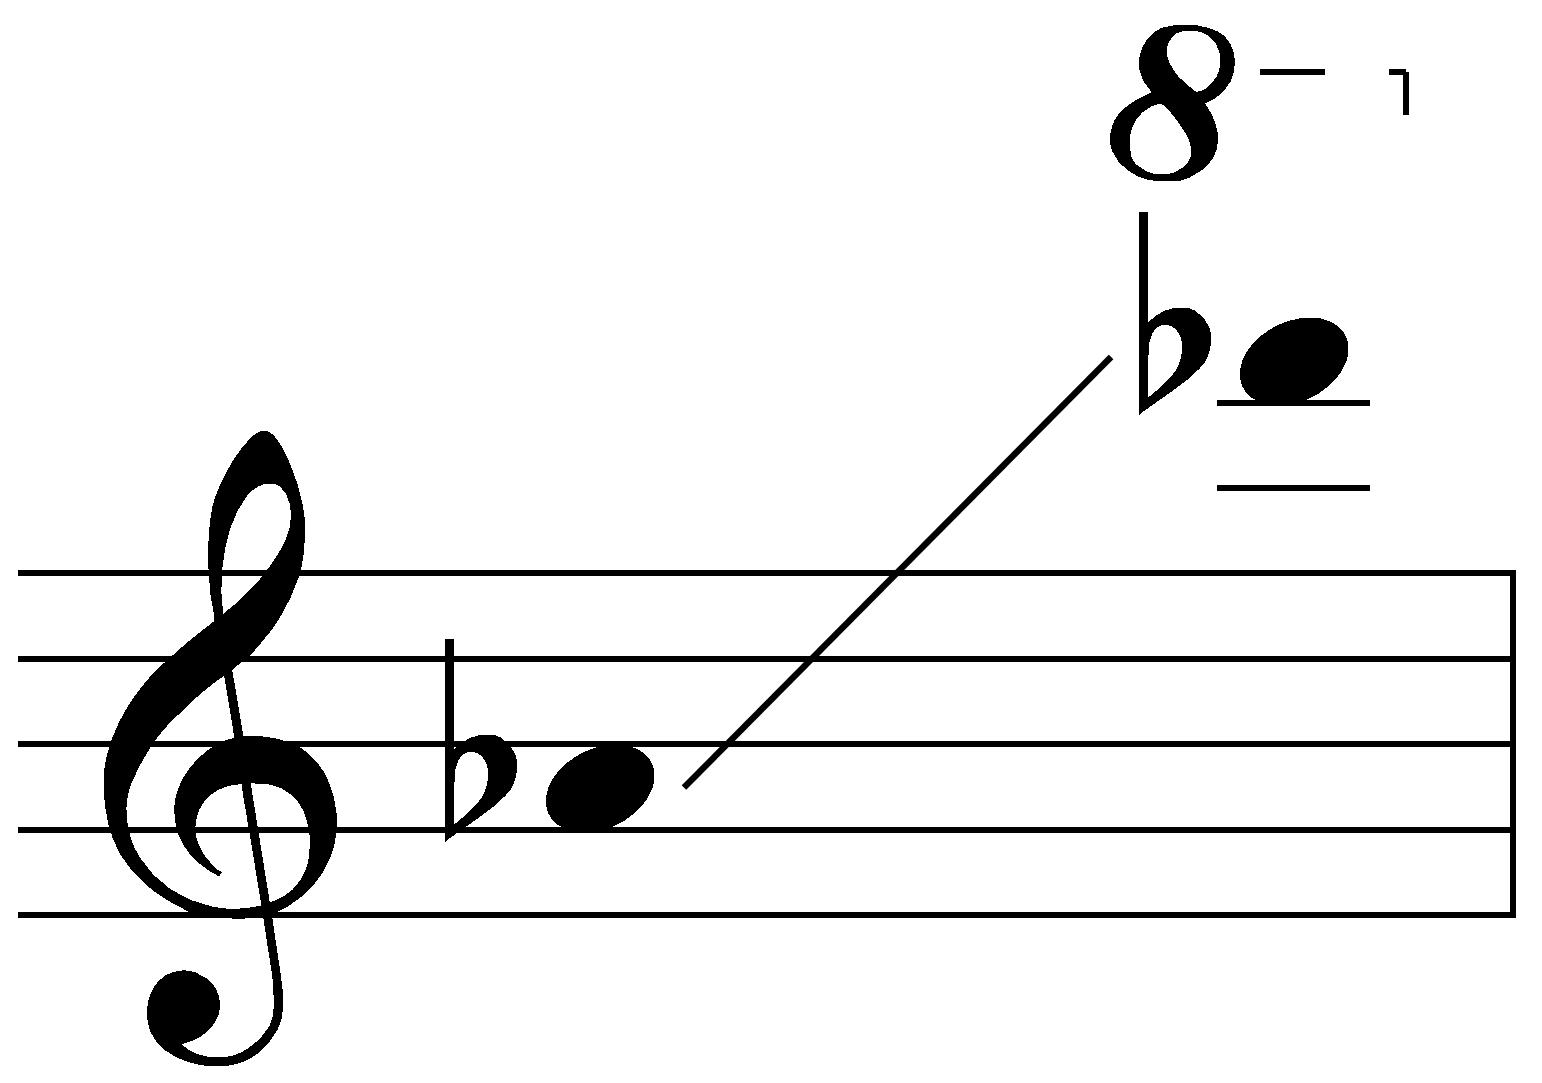 File:Sounding range of sopranissimo saxophone png - Wikimedia Commons